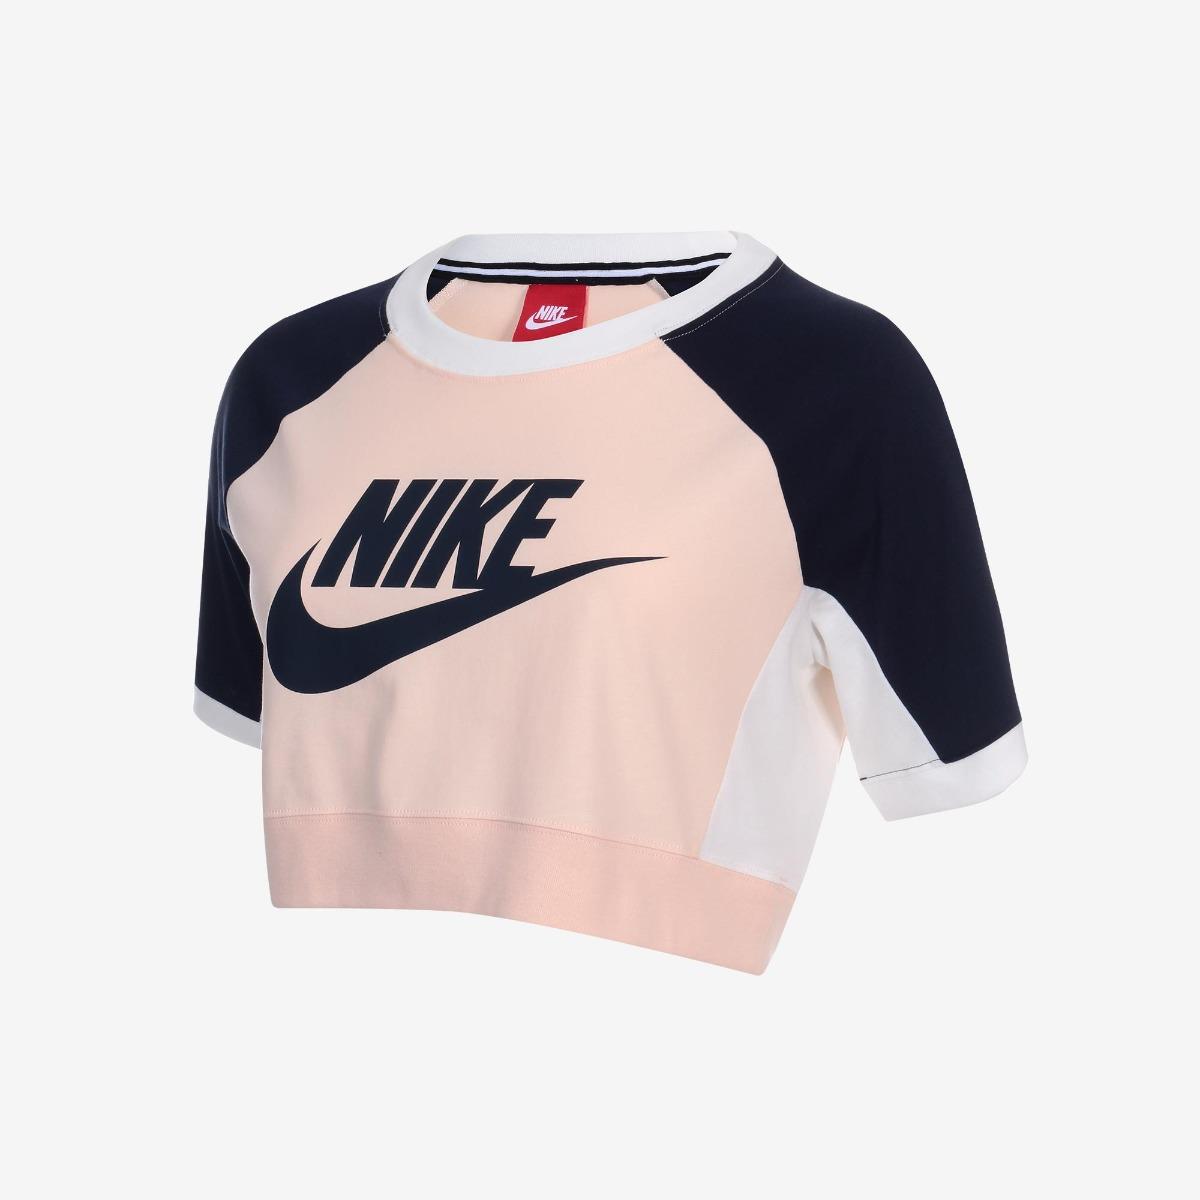 155b5a1b11486 camiseta nike nsw crop feminina. Carregando zoom.